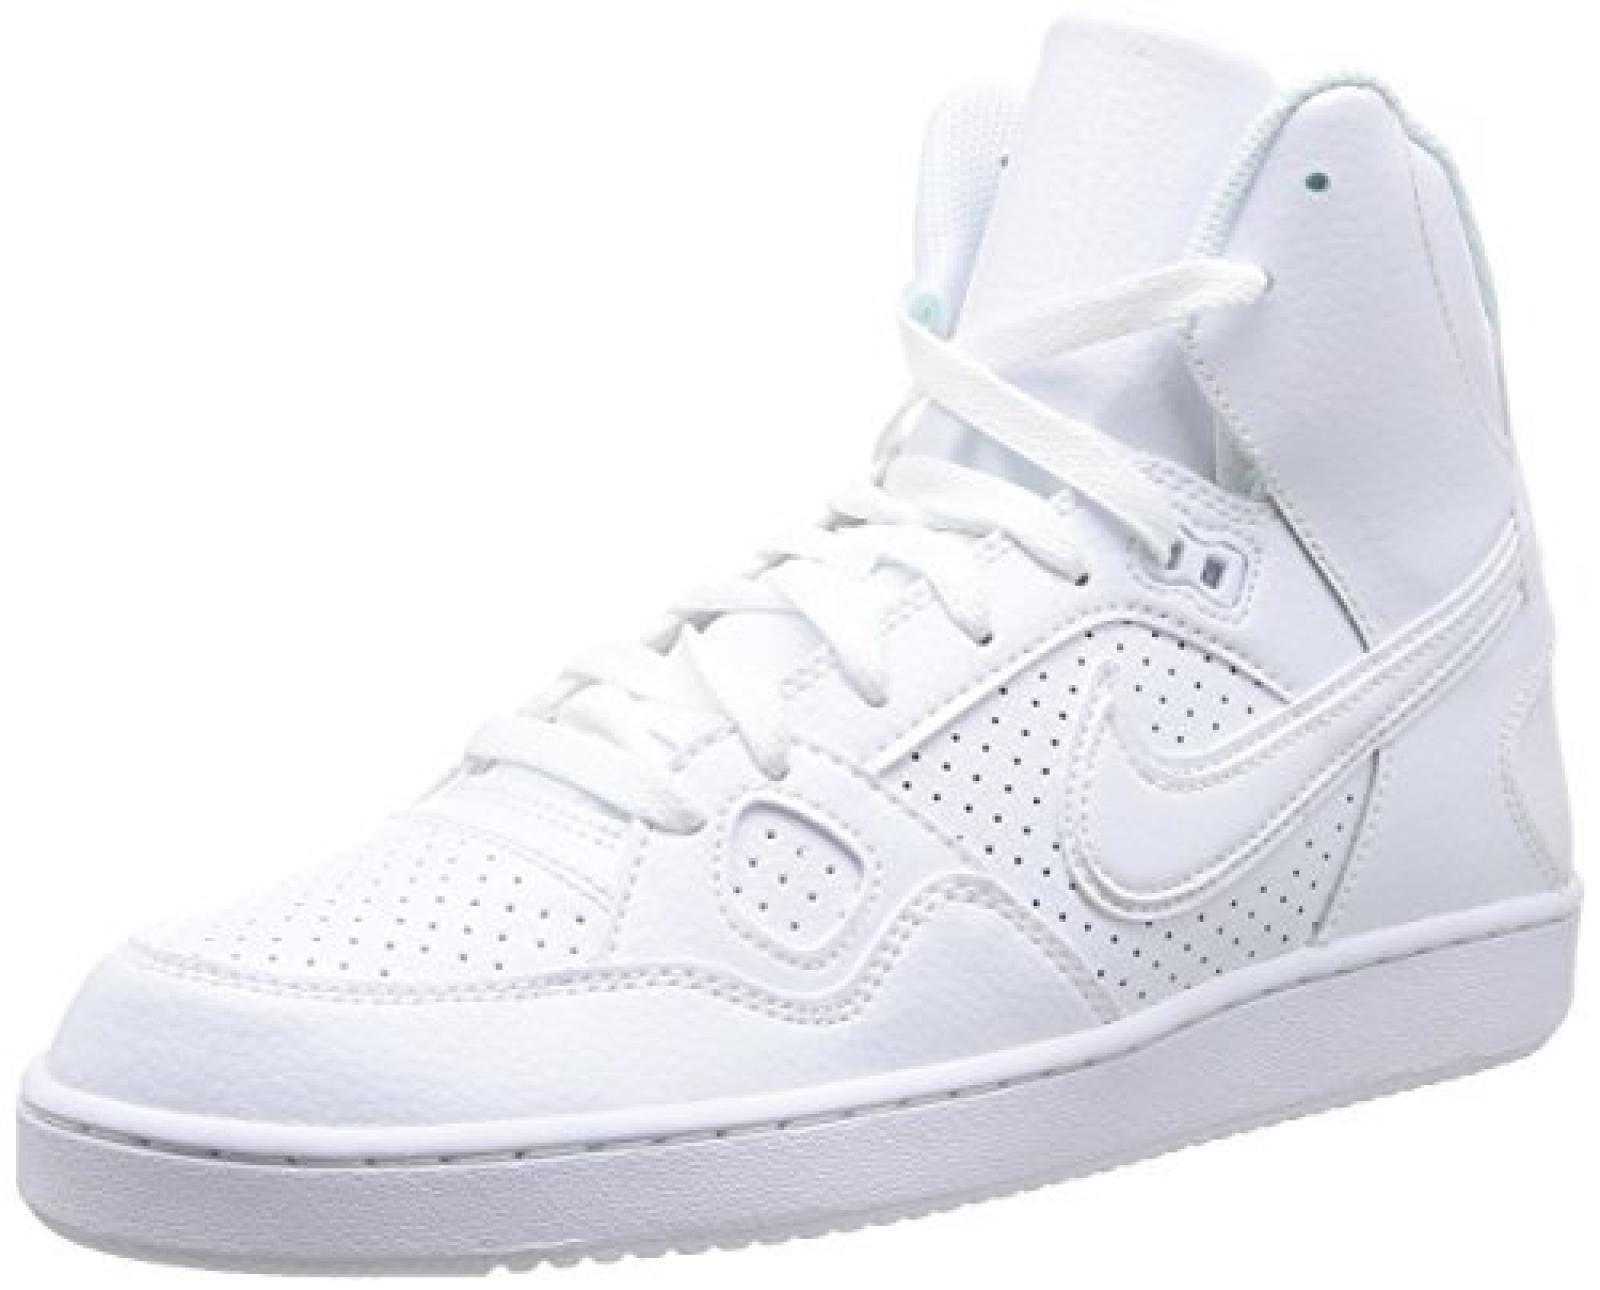 Nike 616281 102 Son Of Force Mid Herren Sportschuhe - Basketball